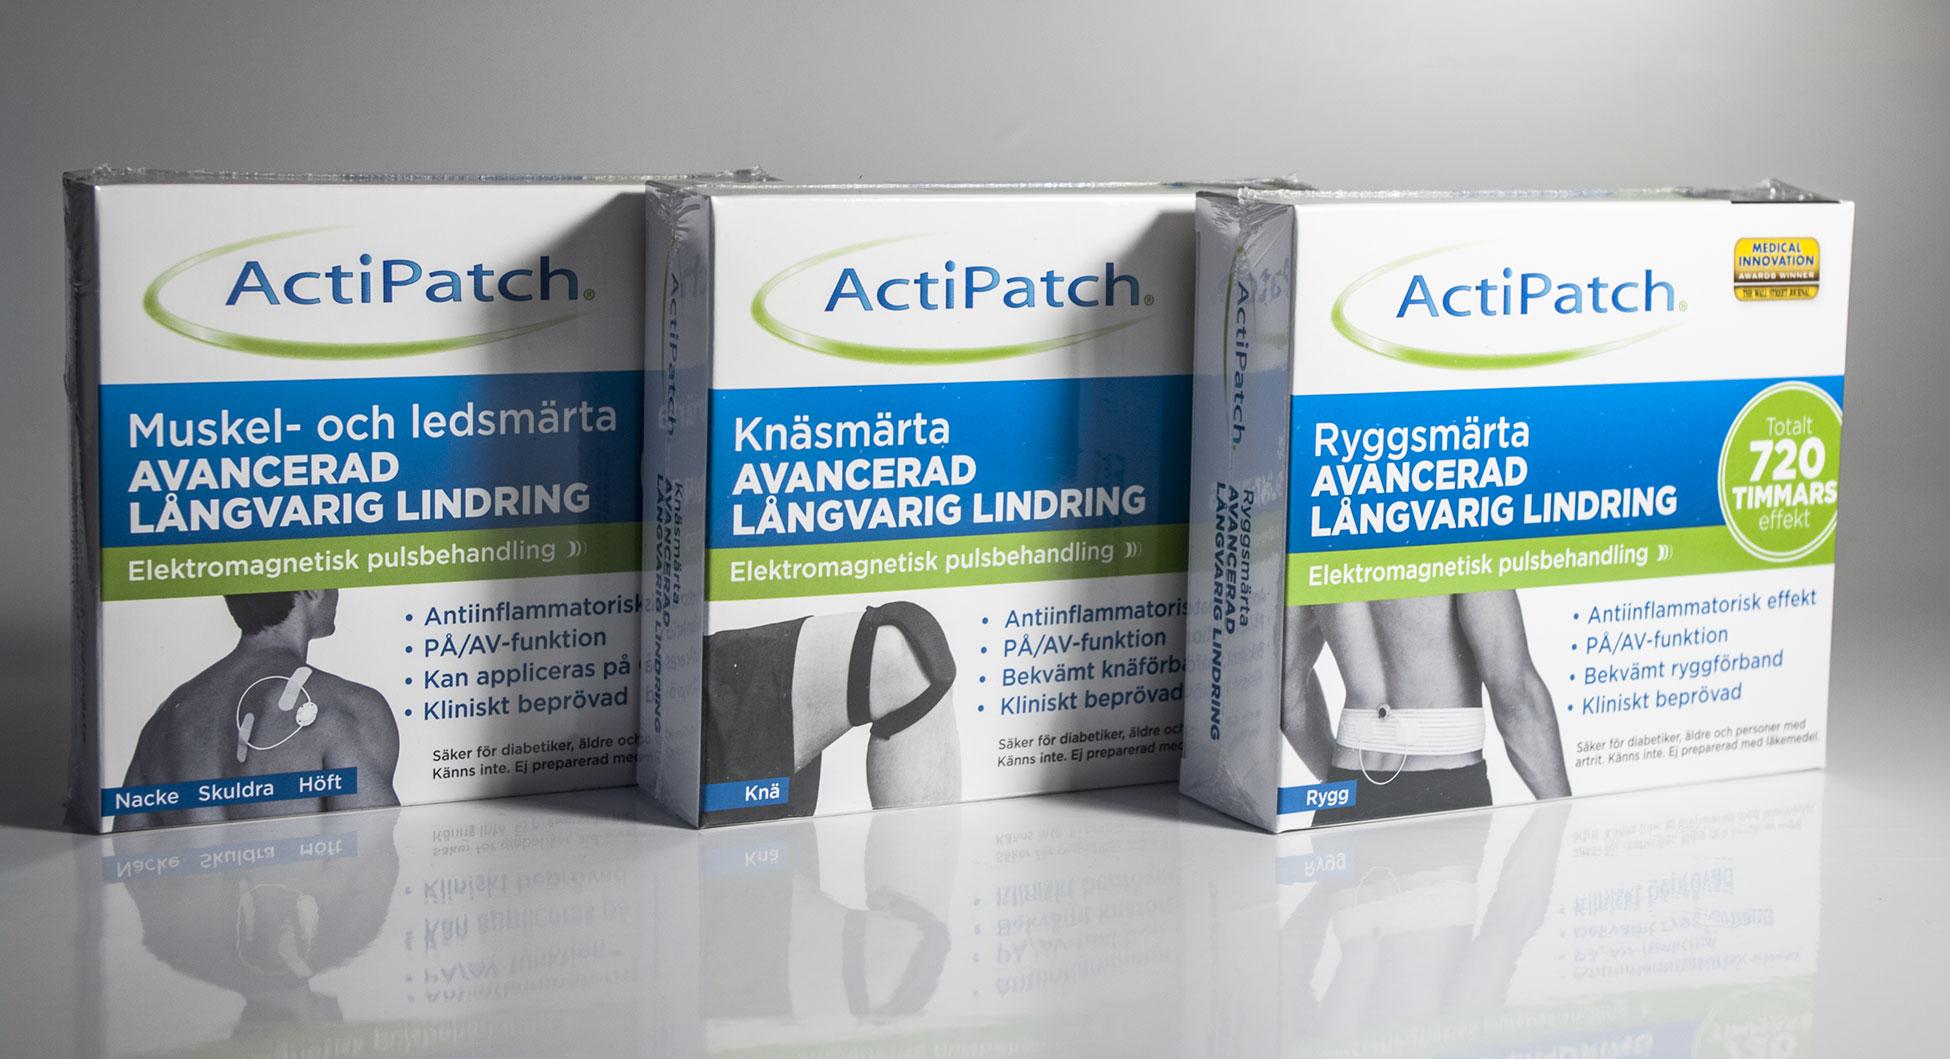 ActiPatch